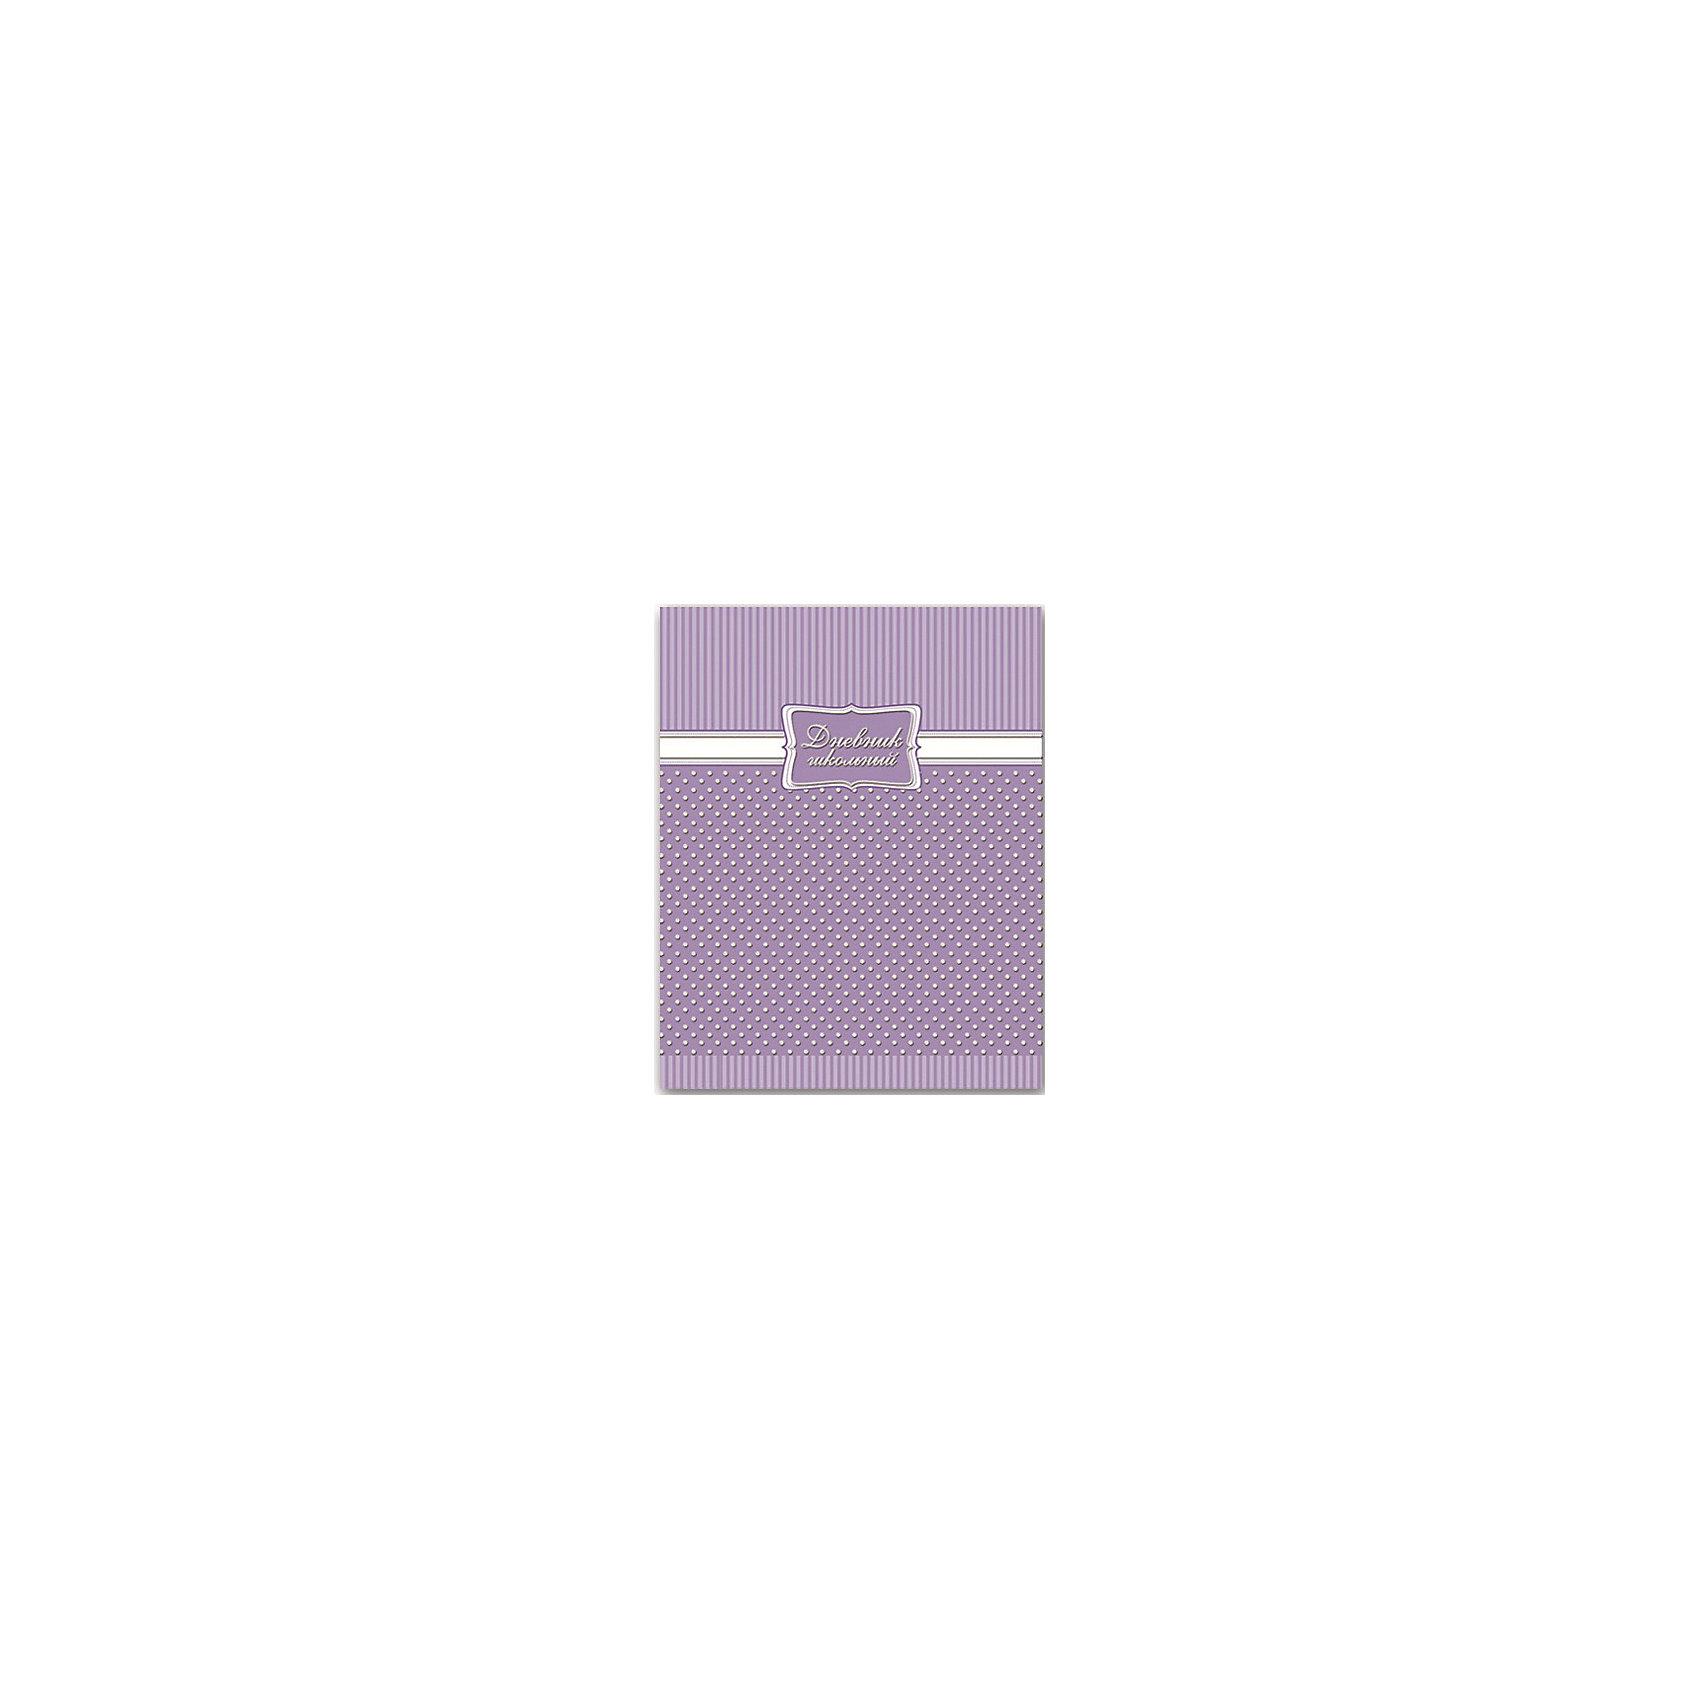 Феникс+ Дневник Кружева на сиреневом б д сурис фронтовой дневник дневник рассказы